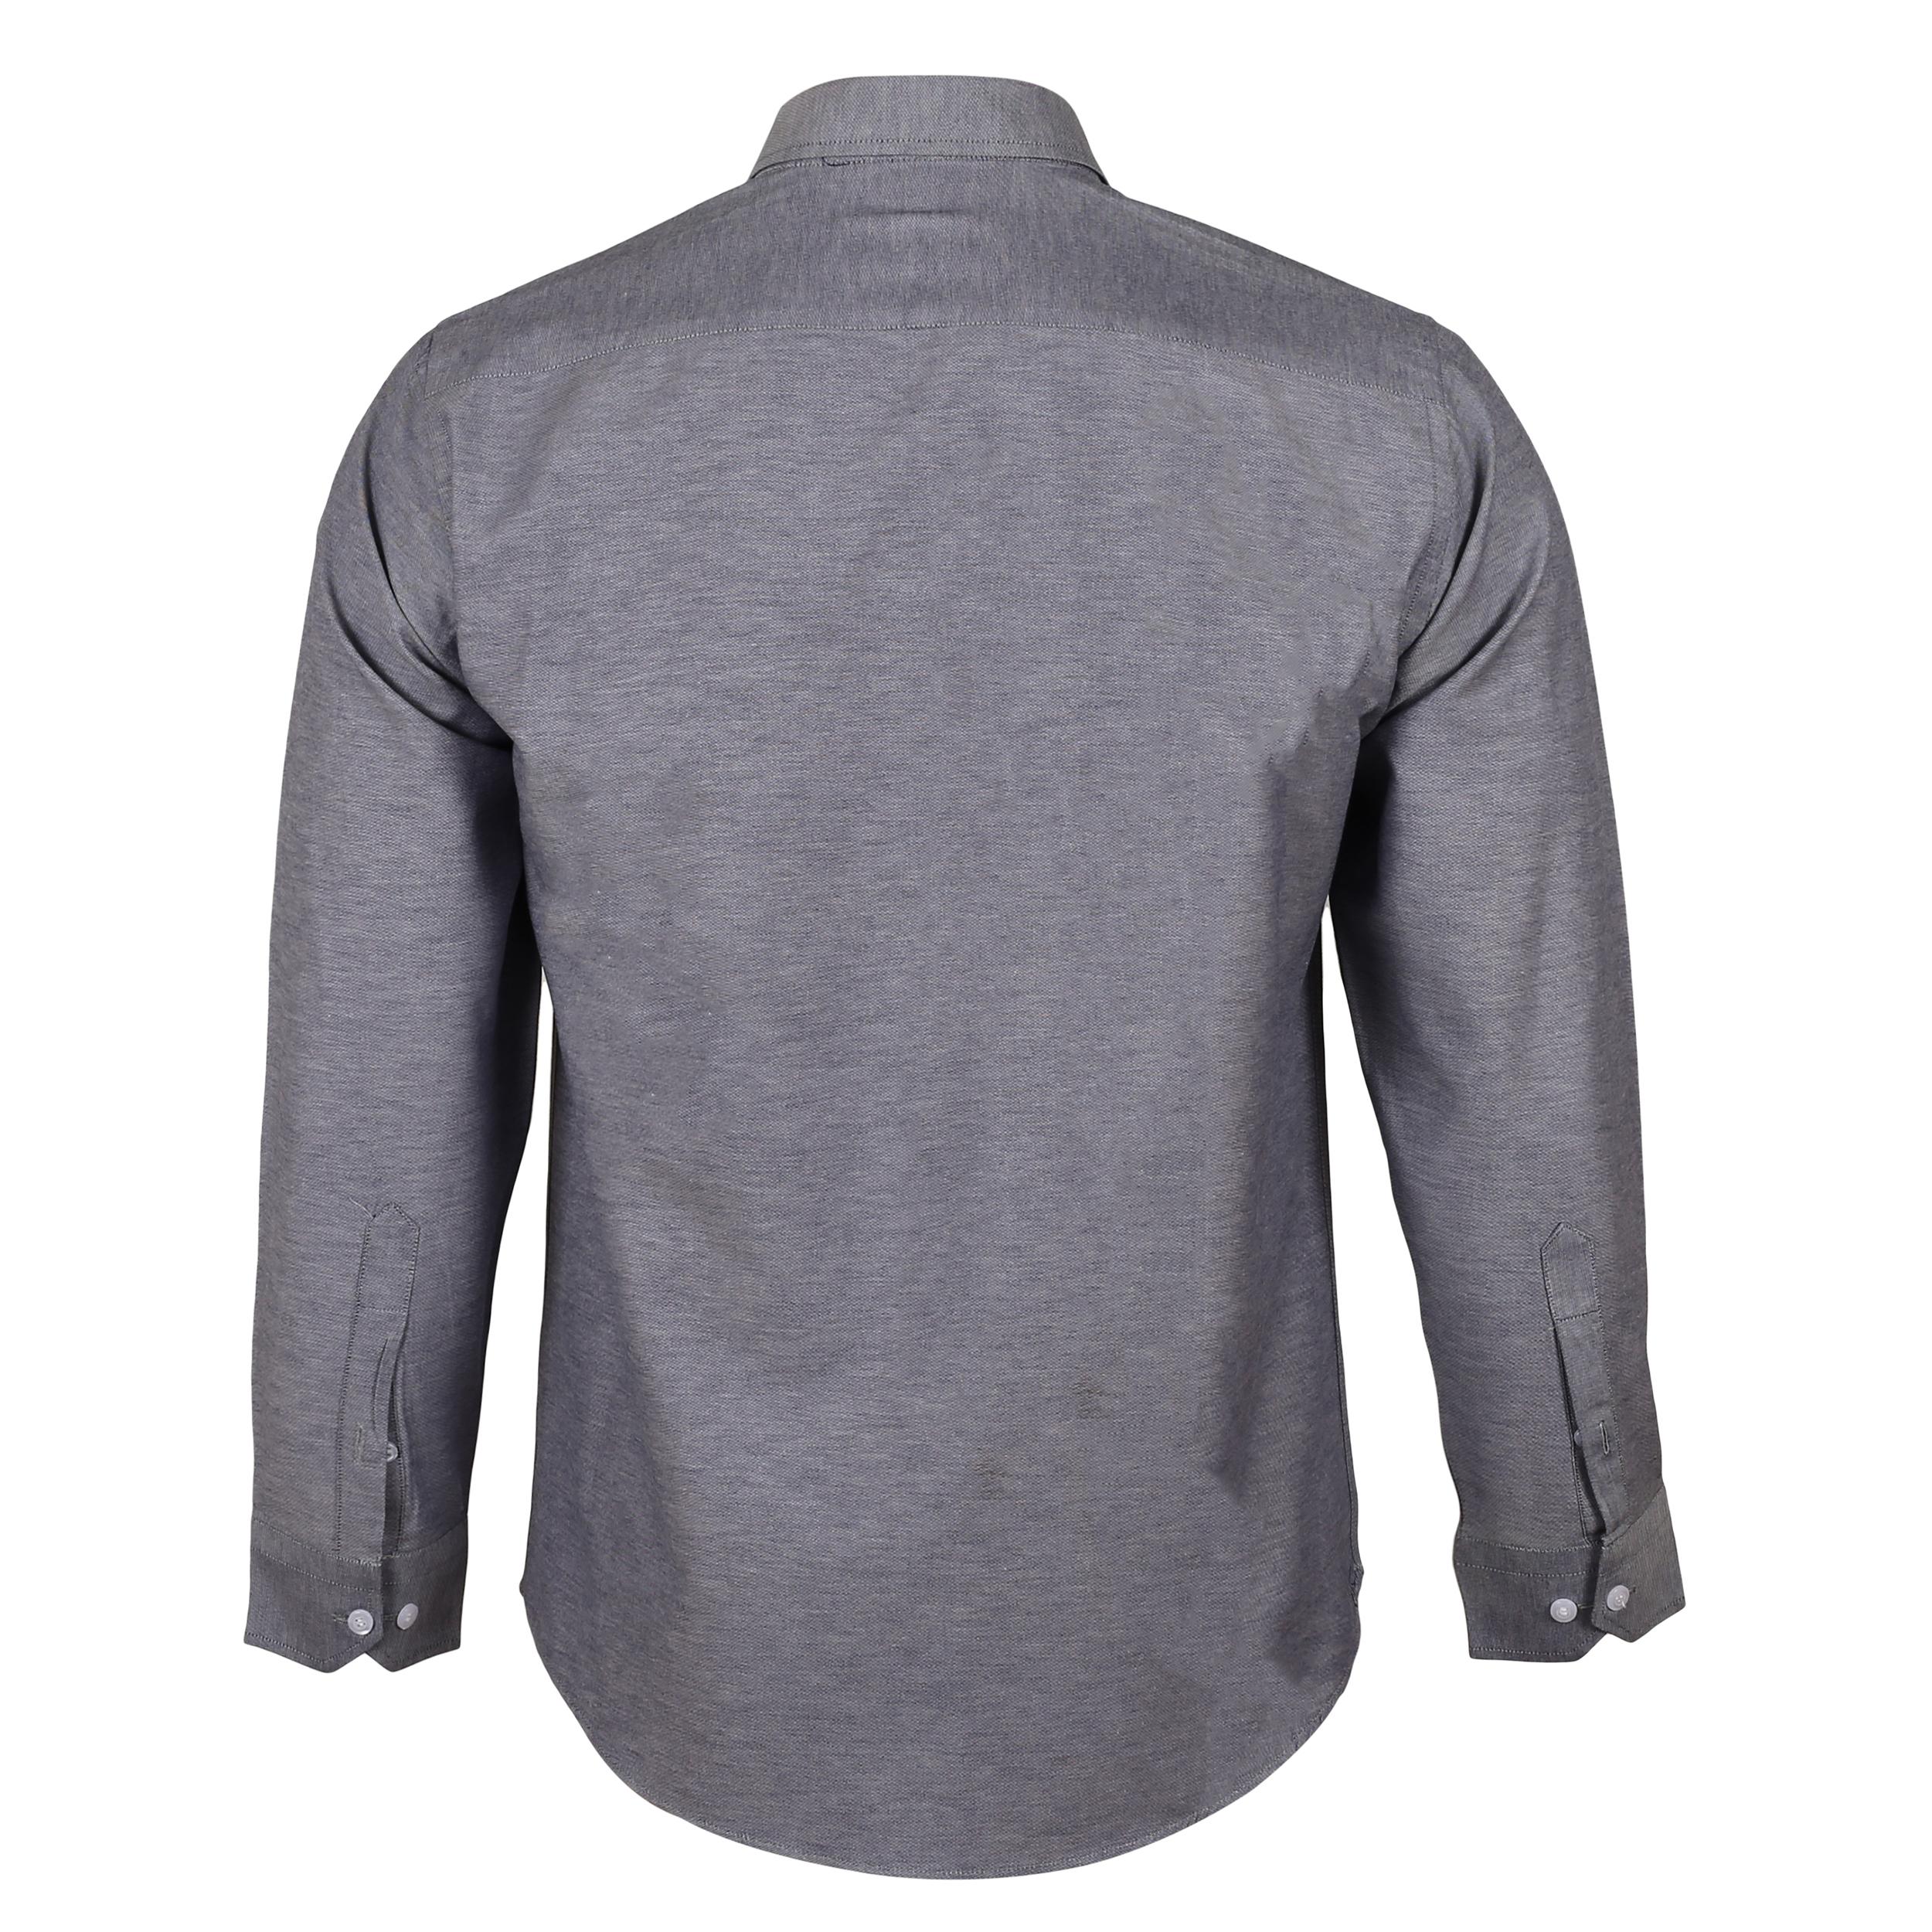 پیراهن آستین بلند مردانه ناوالس مدل NOx8020-GY main 1 2